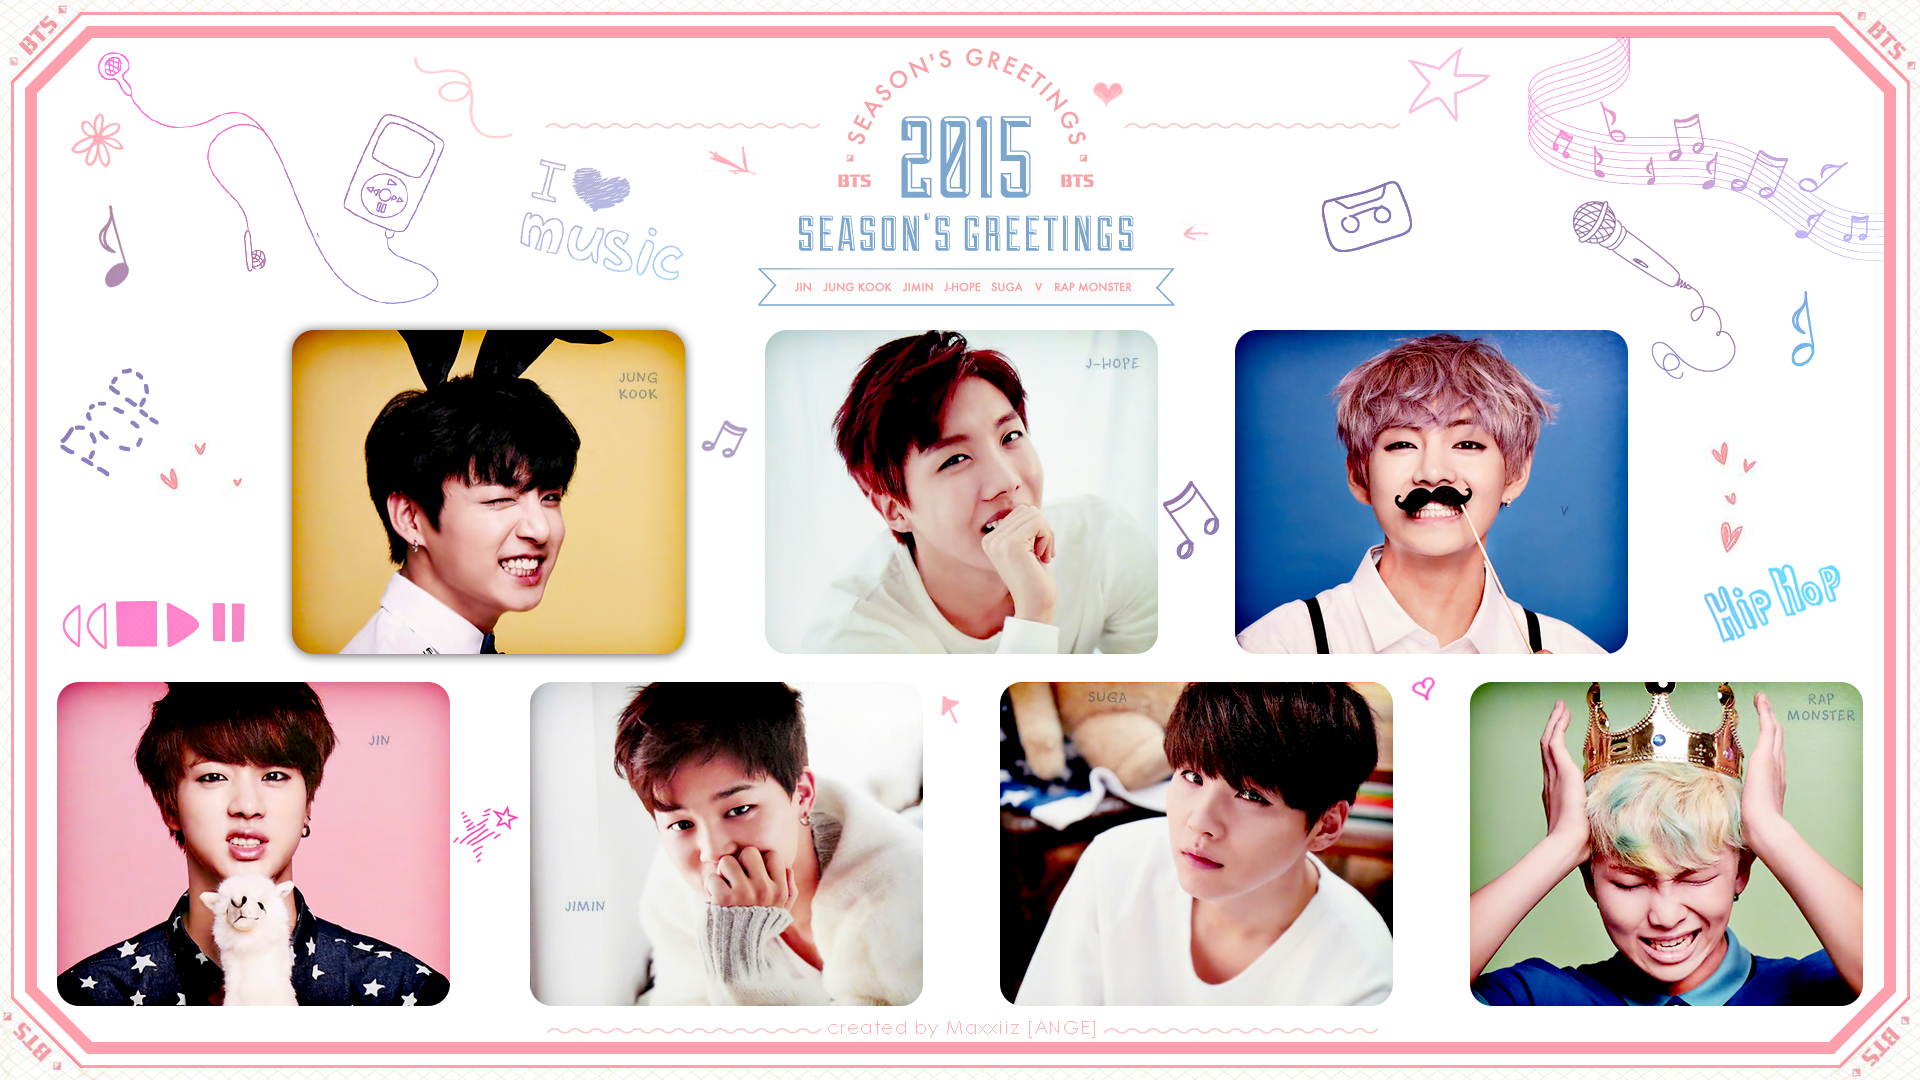 Dvd bts season greeting 2015 pt33 dvd bts season greeting 2015 pt33 m4hsunfo